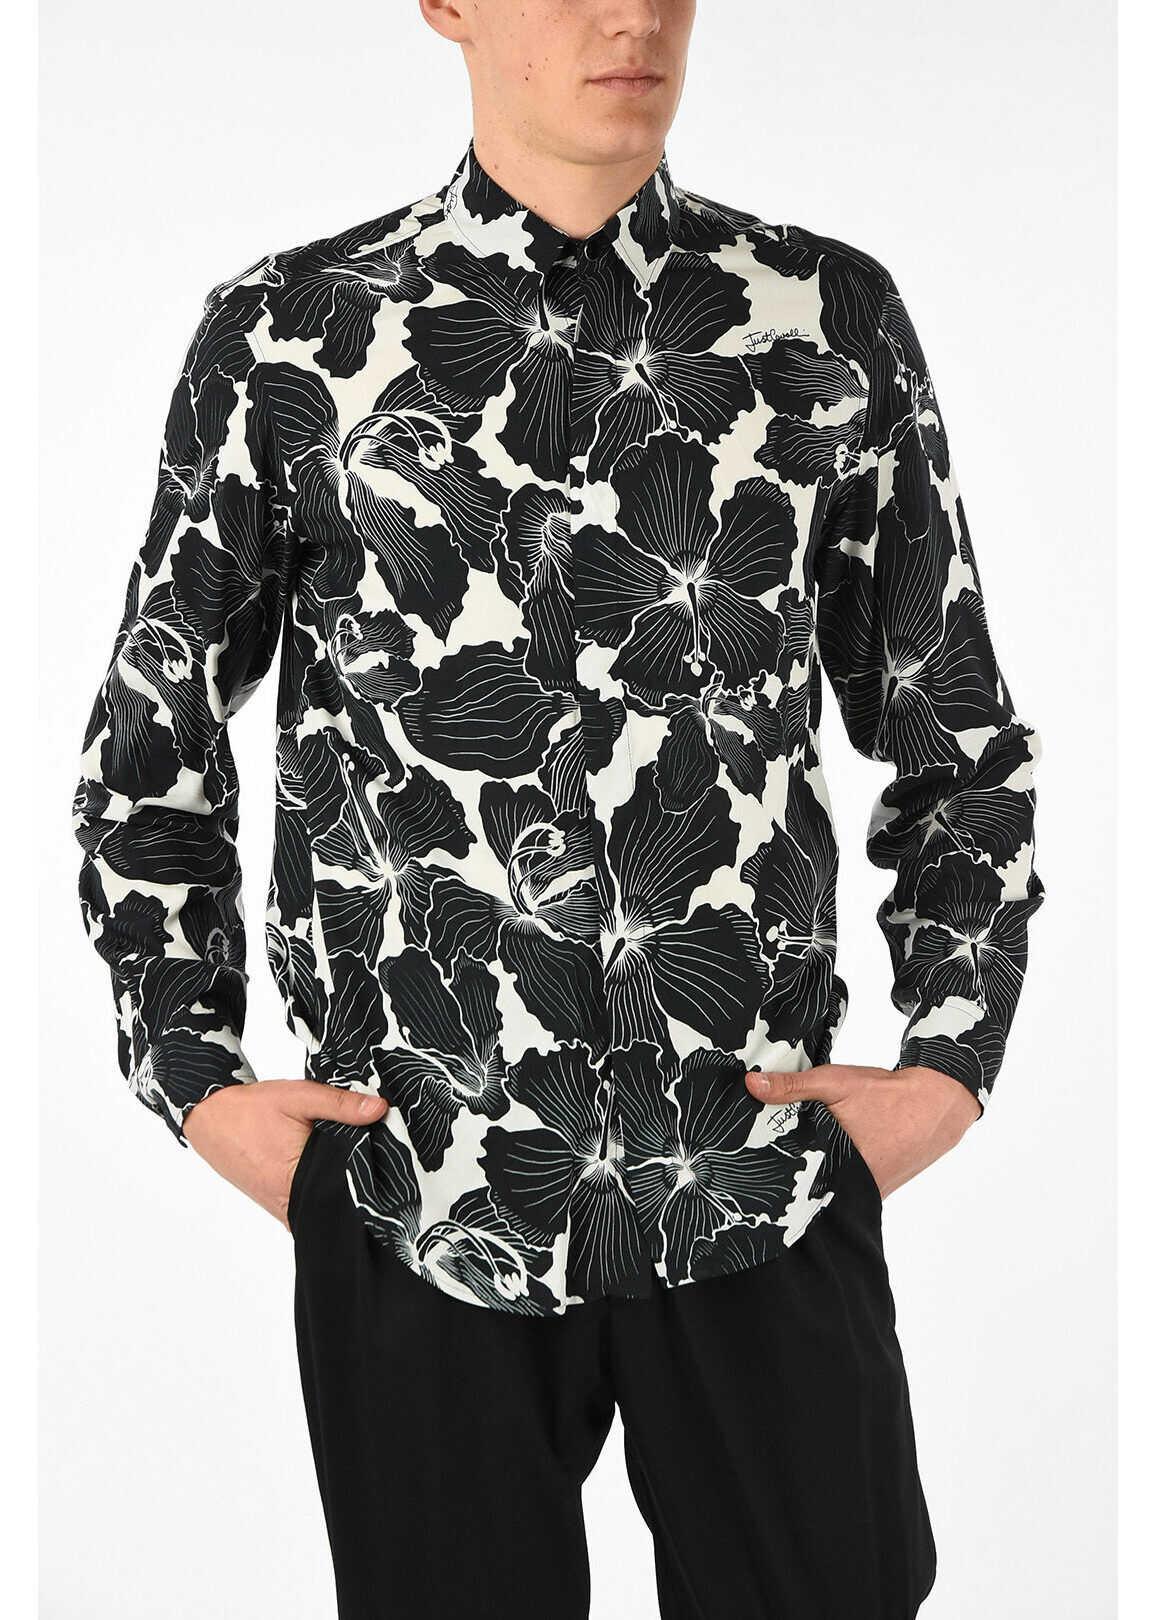 Just Cavalli Floral Printed Shirt BLACK & WHITE